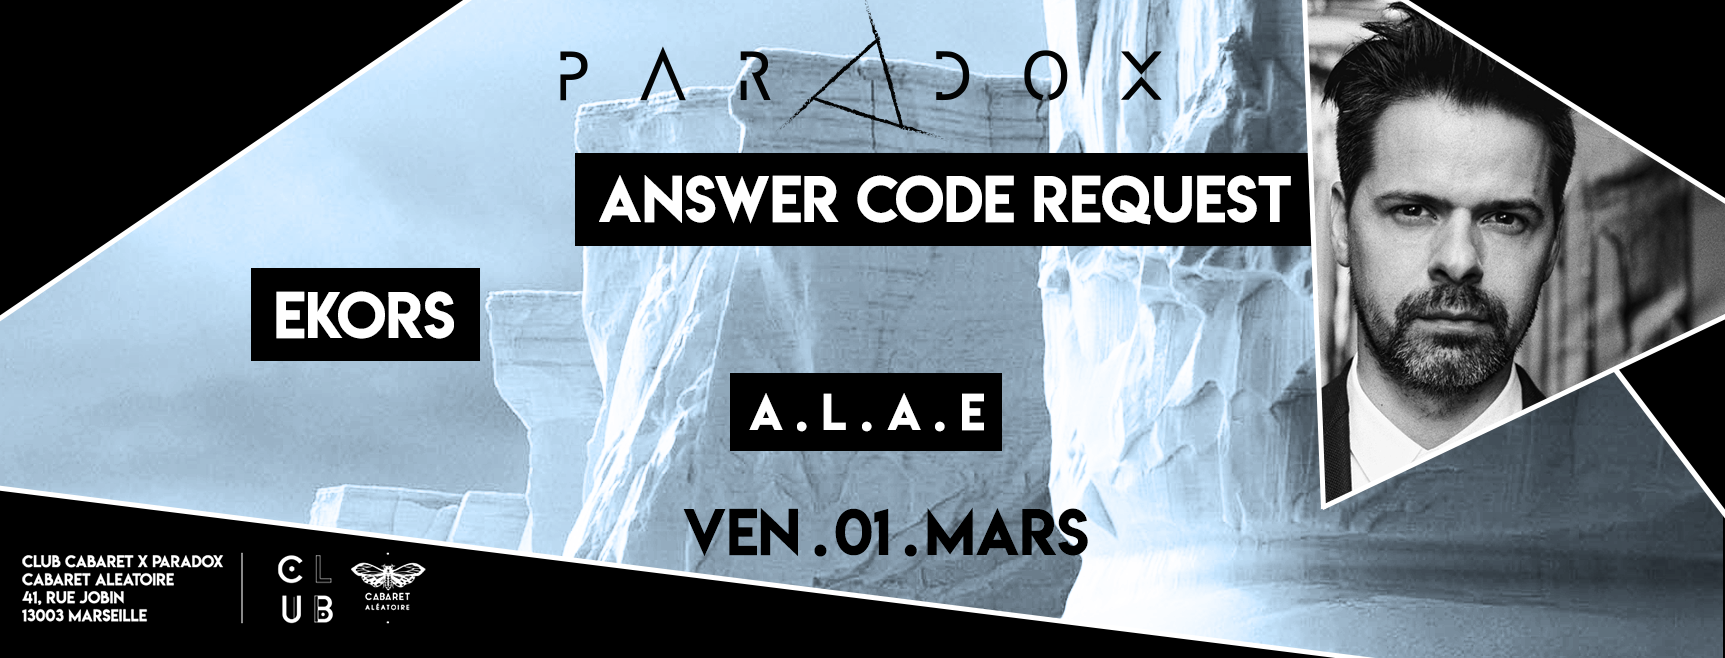 Club Cabaret x Paradox : Answer Code Request + Ekors +...